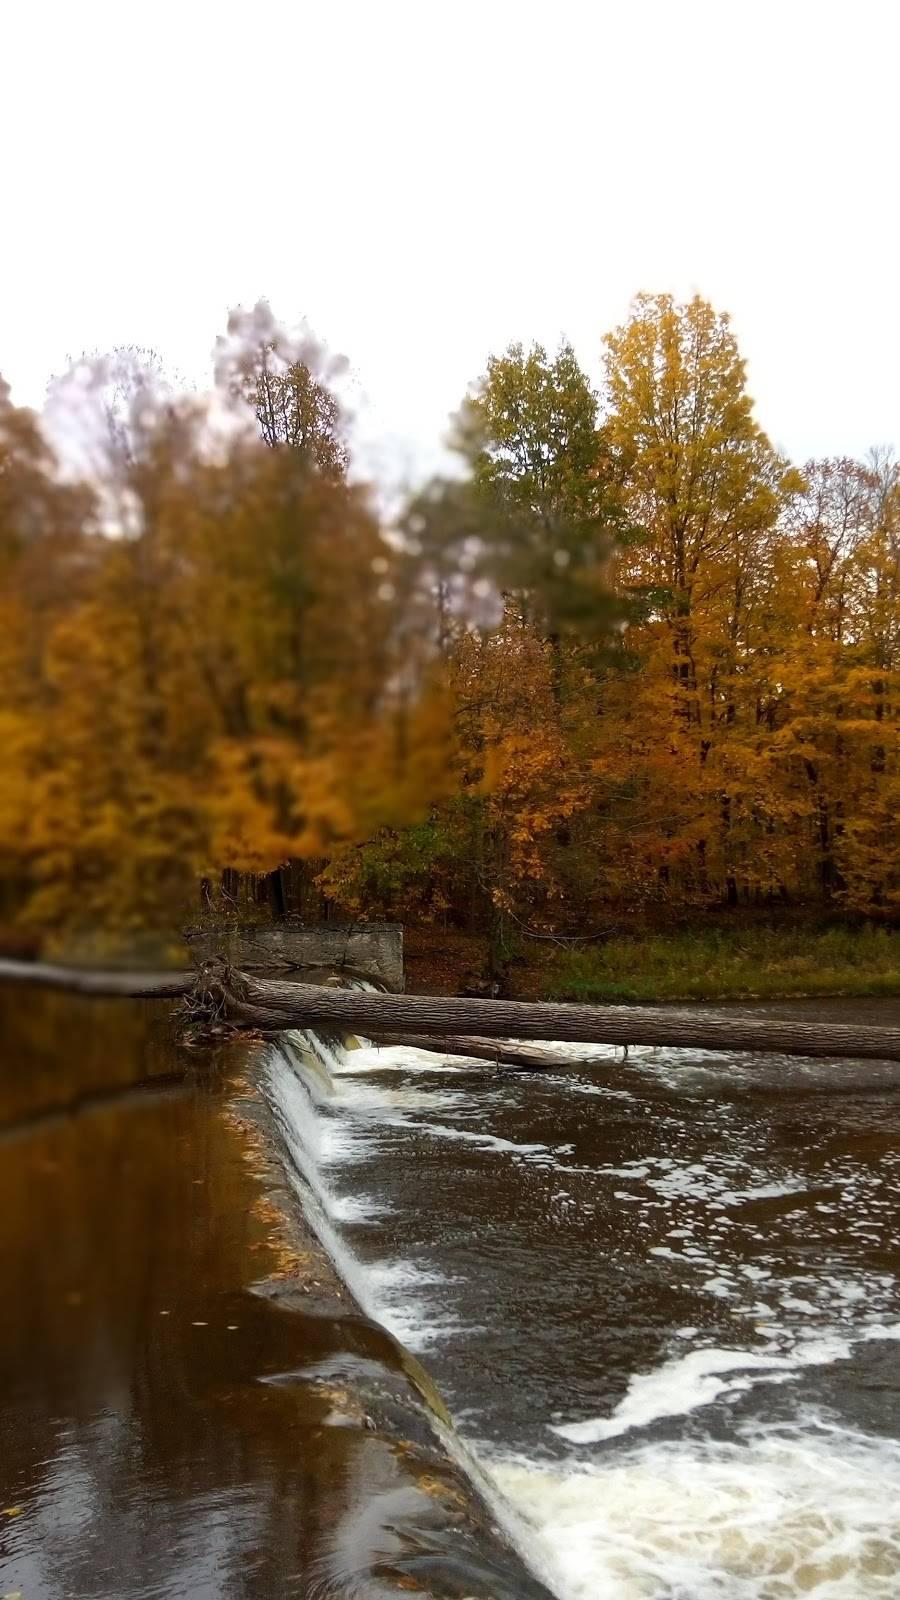 Elma Town Green - park  | Photo 1 of 3 | Address: Bowen Rd, Elma, NY 14059, USA | Phone: (716) 651-4619